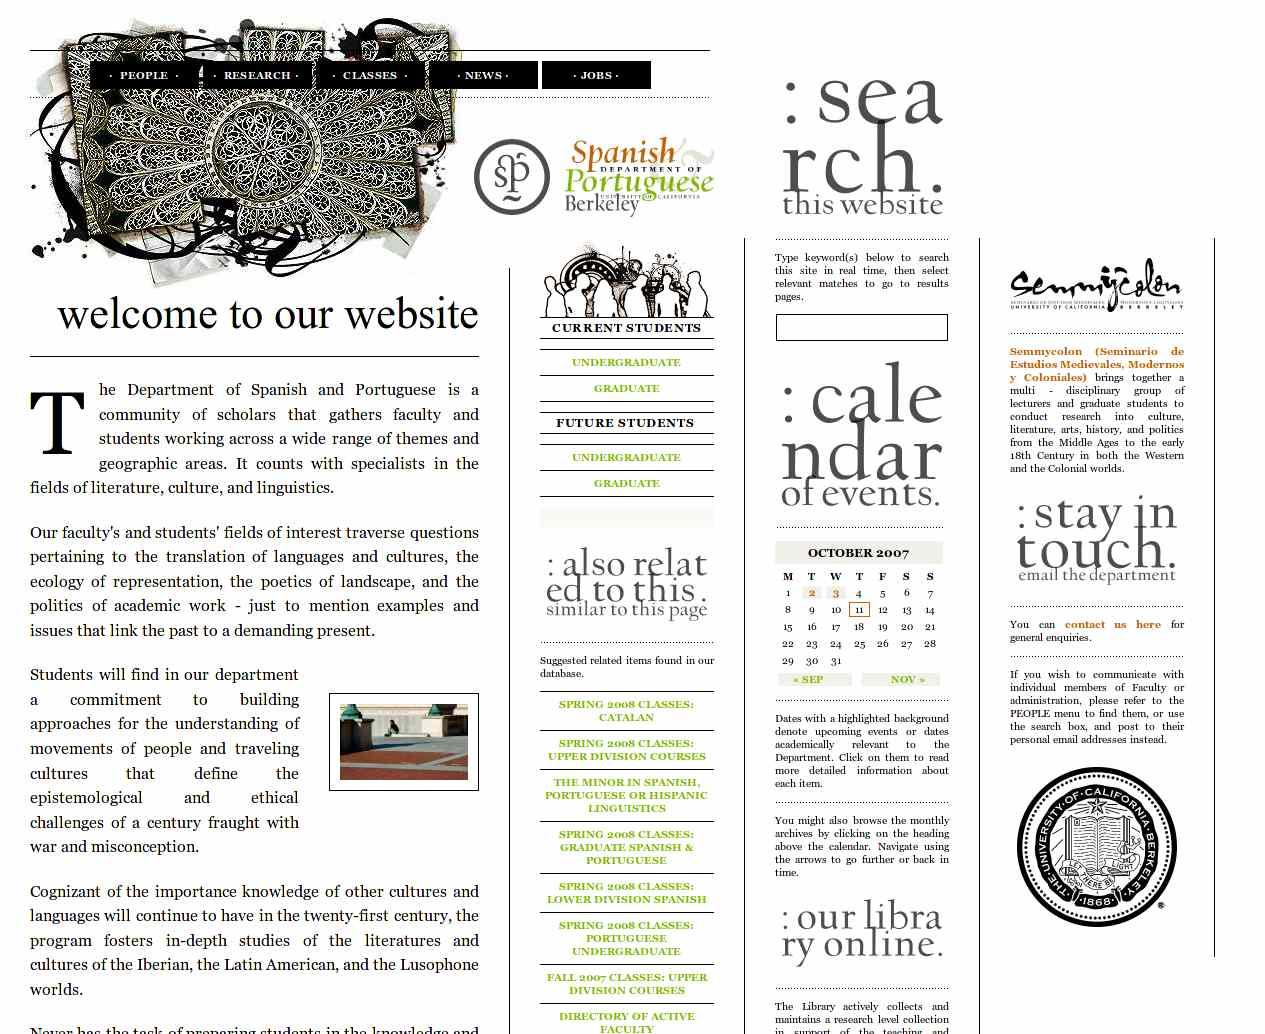 berkeley page 4 columns